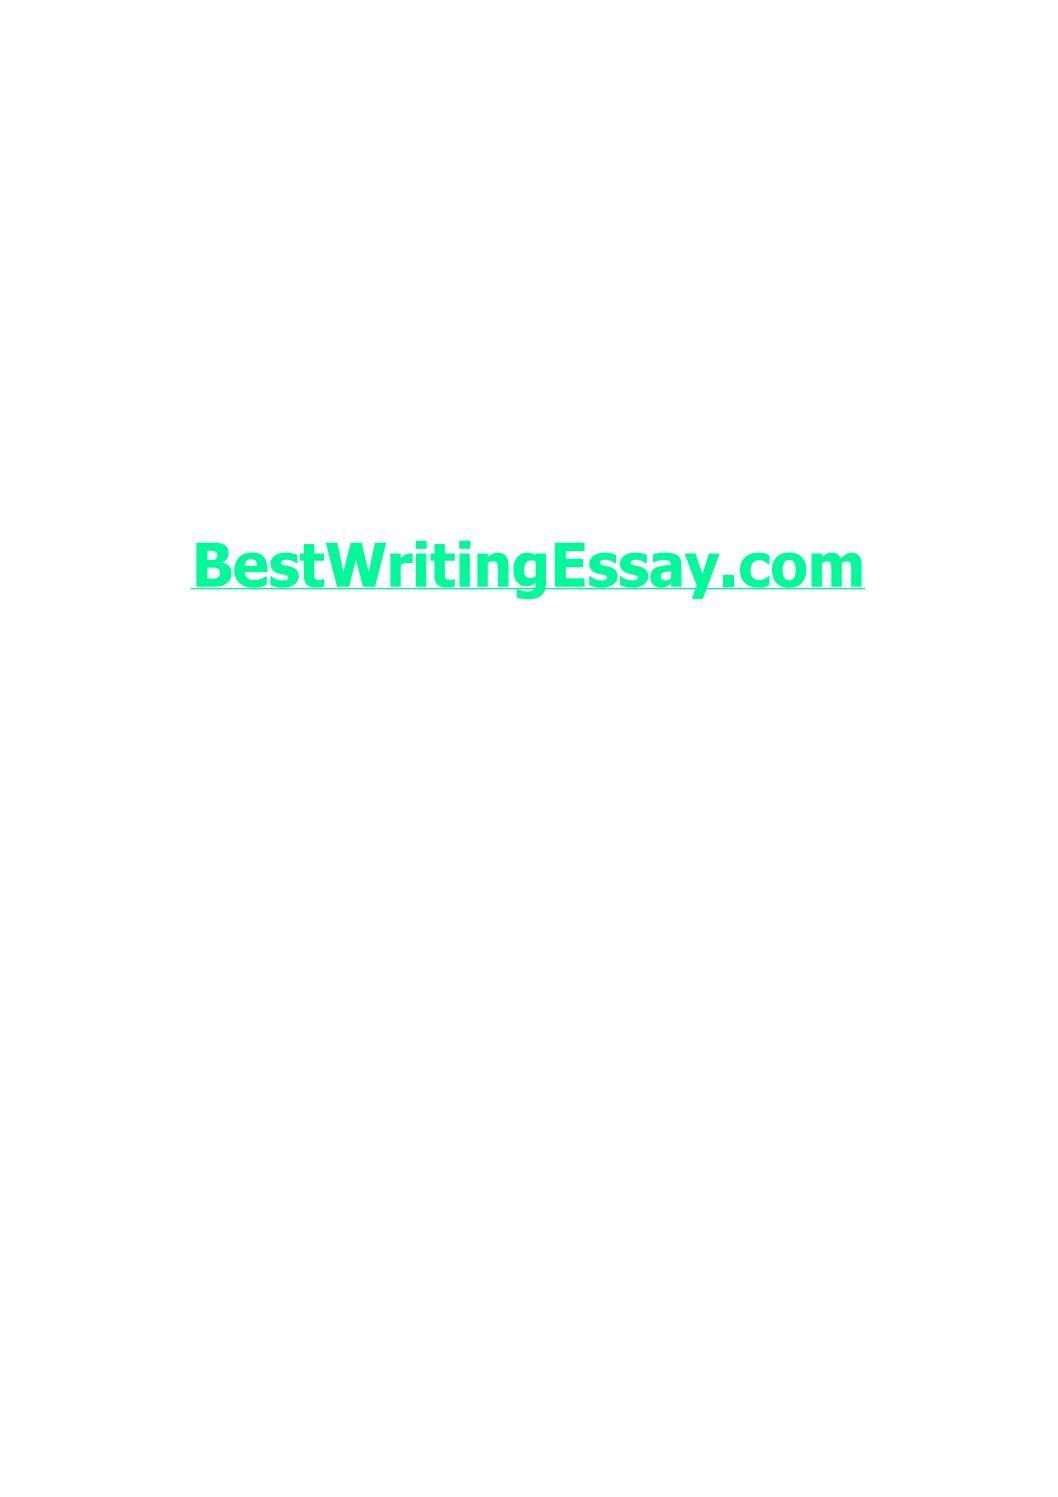 Cheap creative writing editor website usa